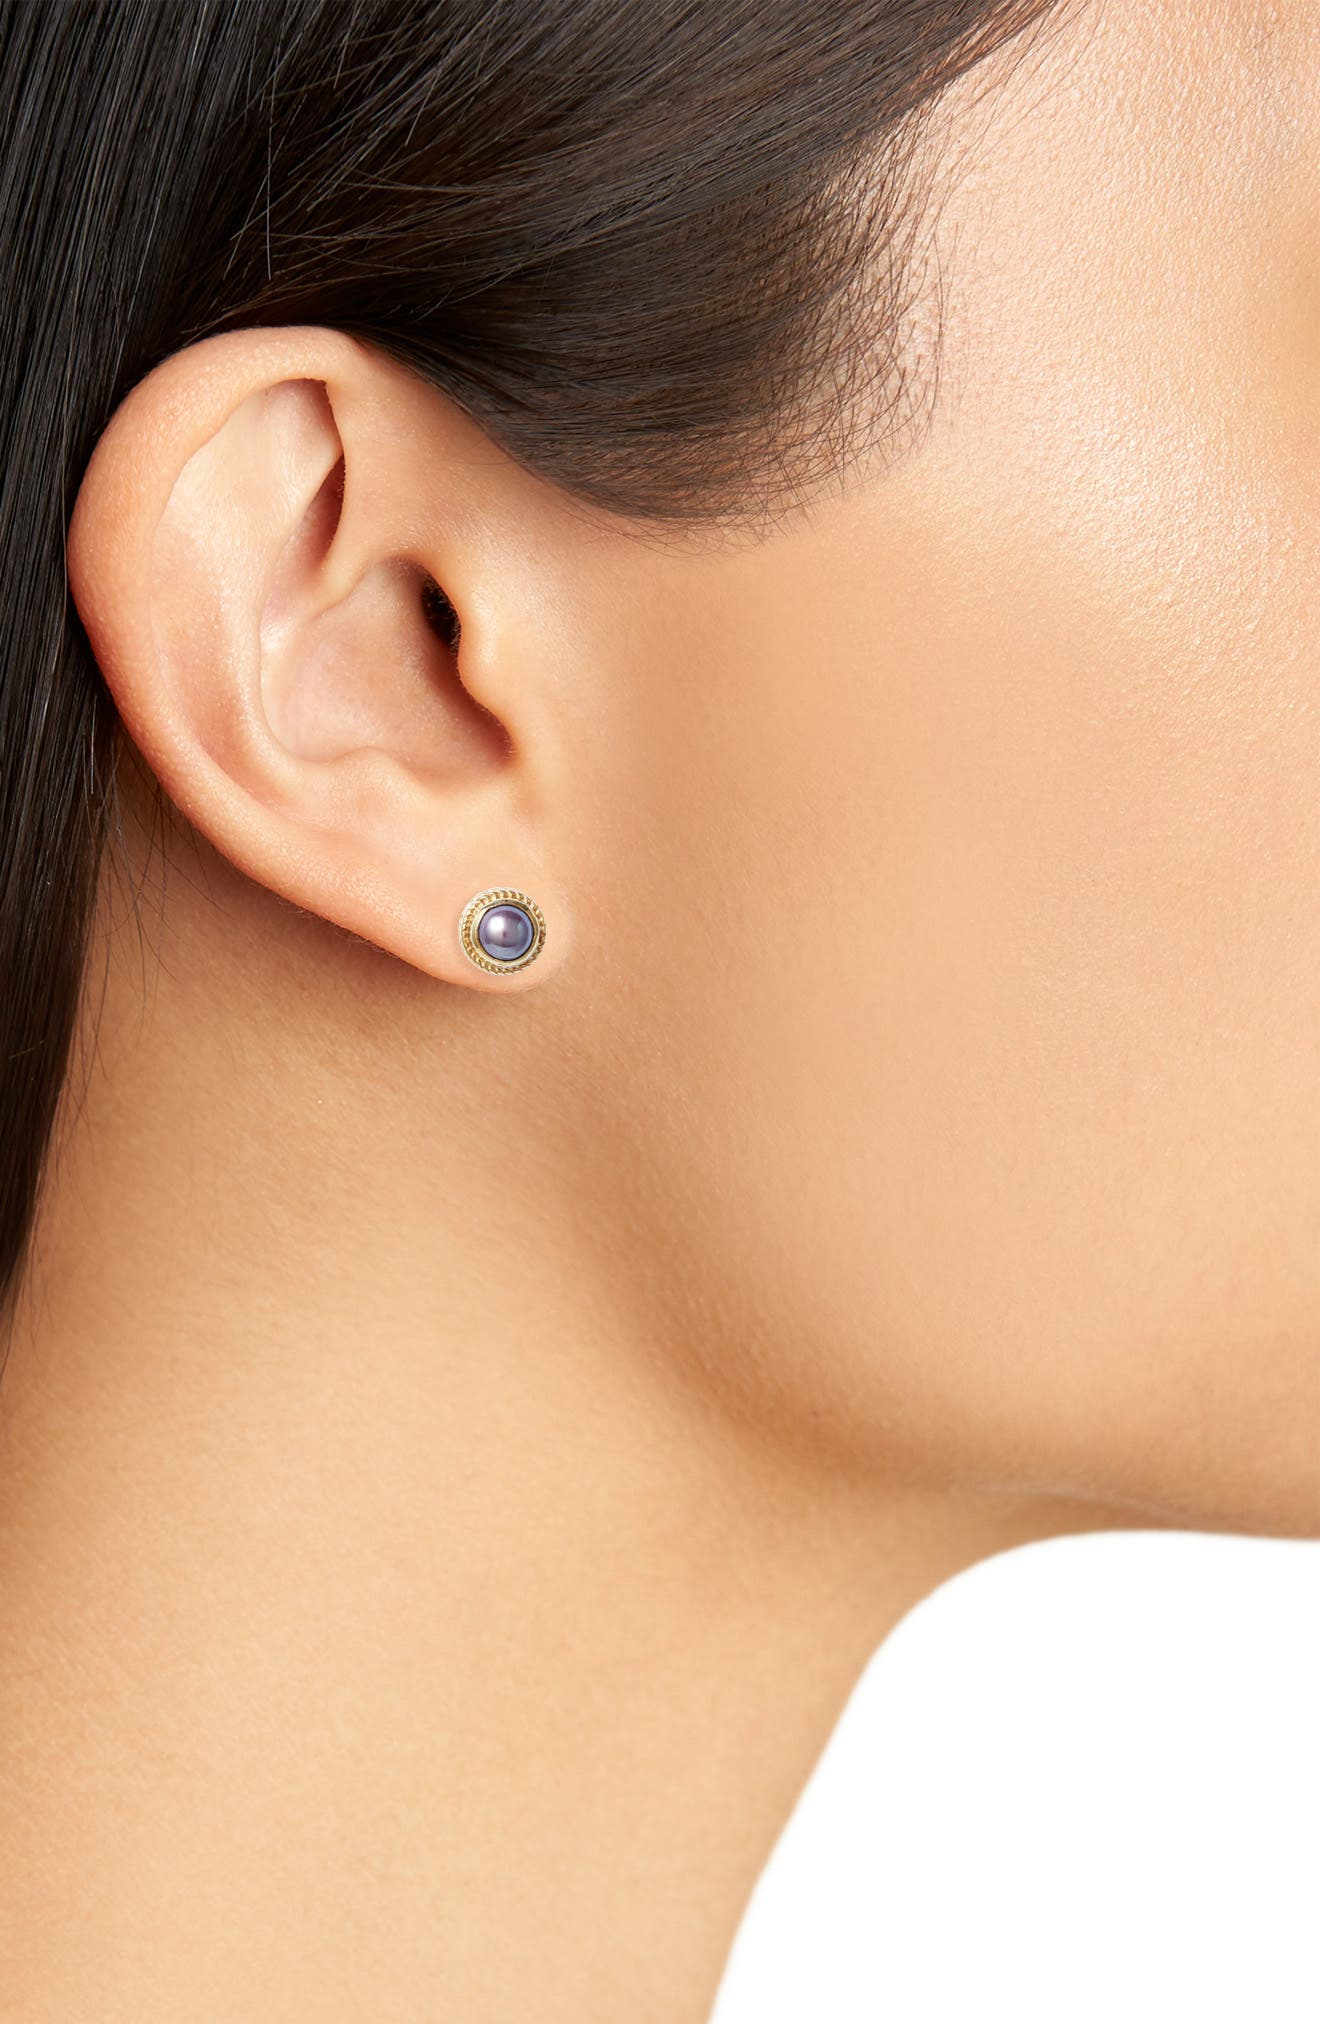 Genuine Blue Pearl Stud Earrings,                             Alternate thumbnail 2, color,                             400